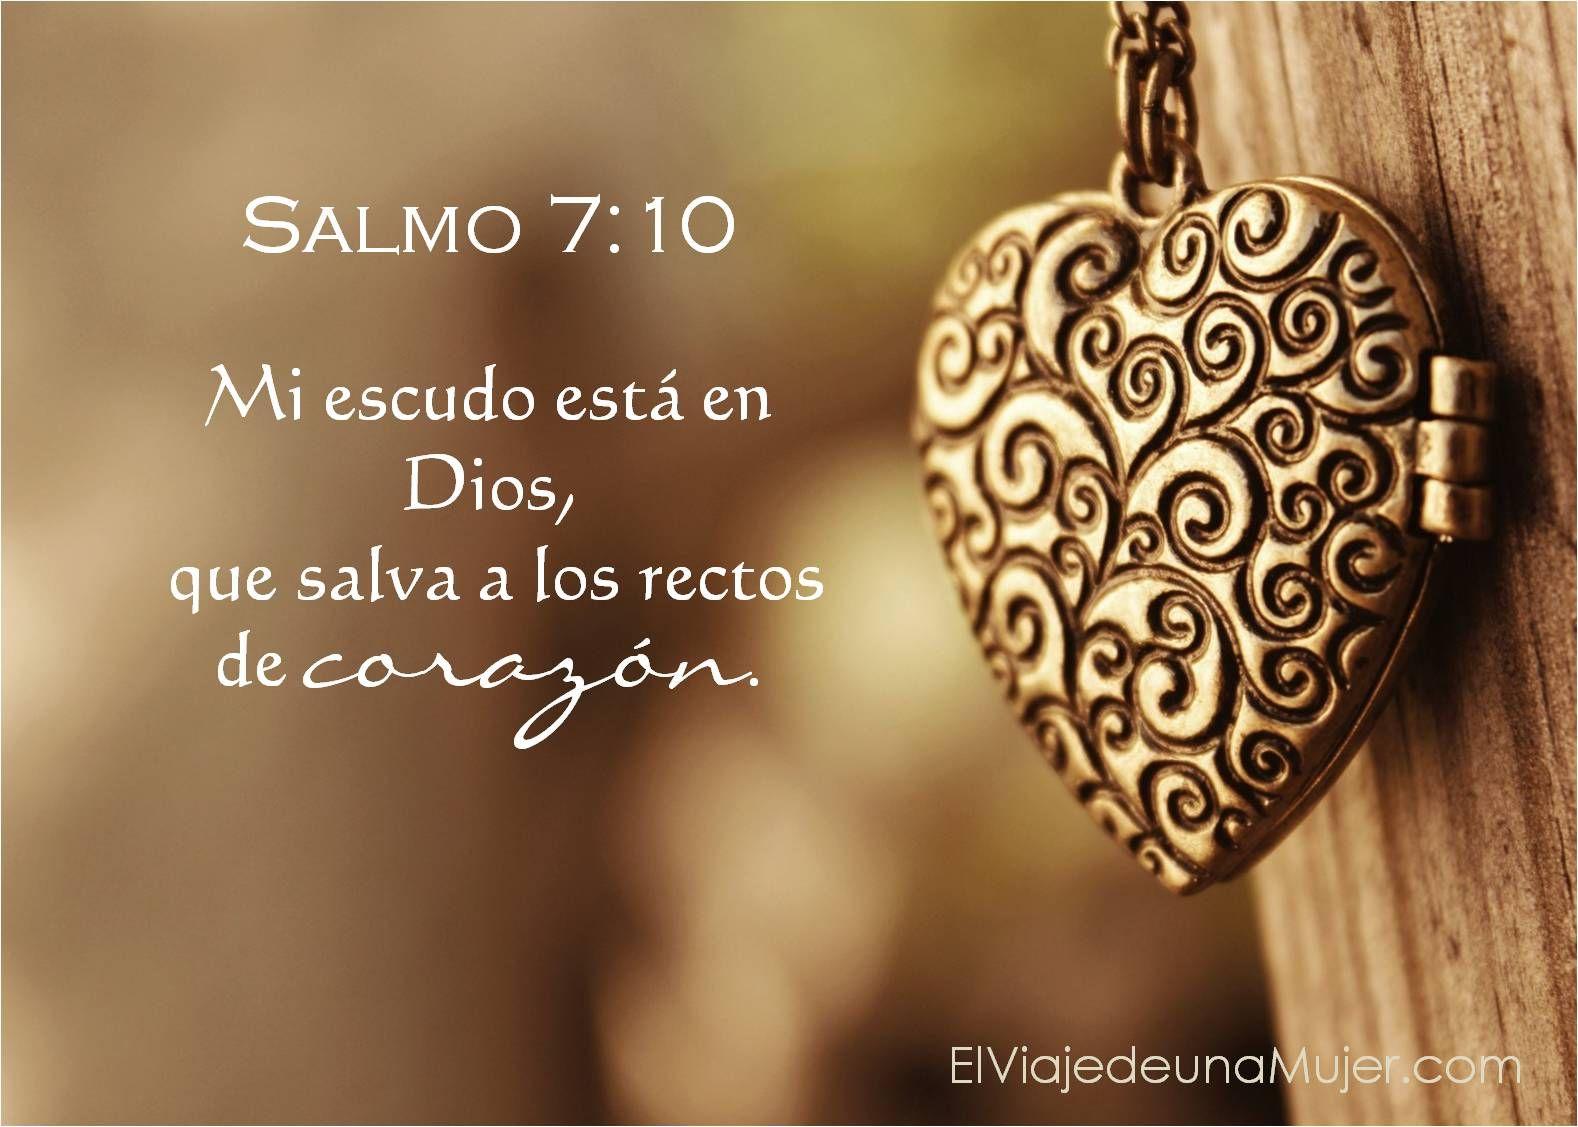 www.elviajedeunamujer.com | textos biblicos | Pinterest | Salmos ...